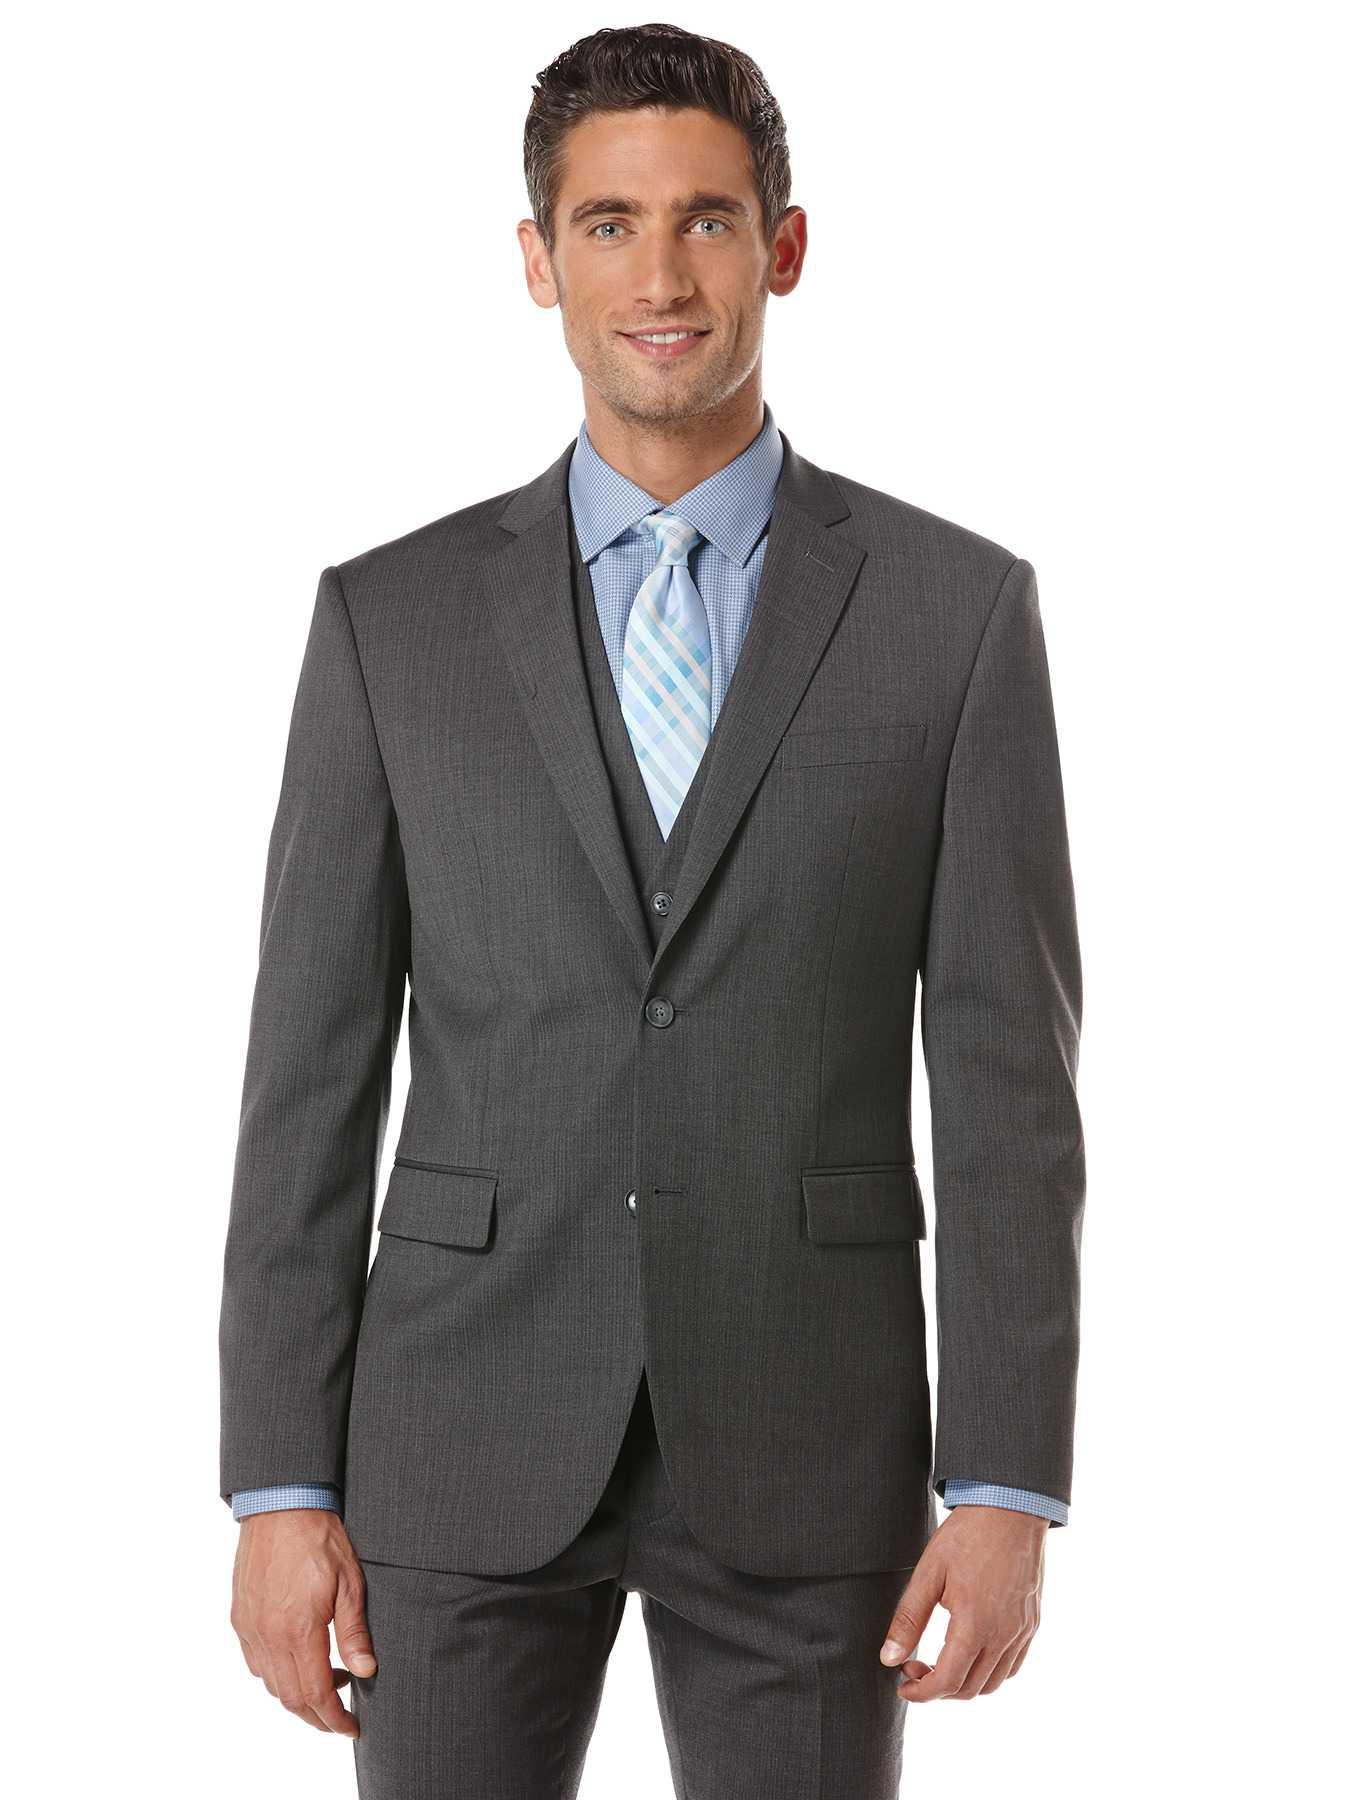 Perry Ellis Charcoal Stripe Suit Jacket